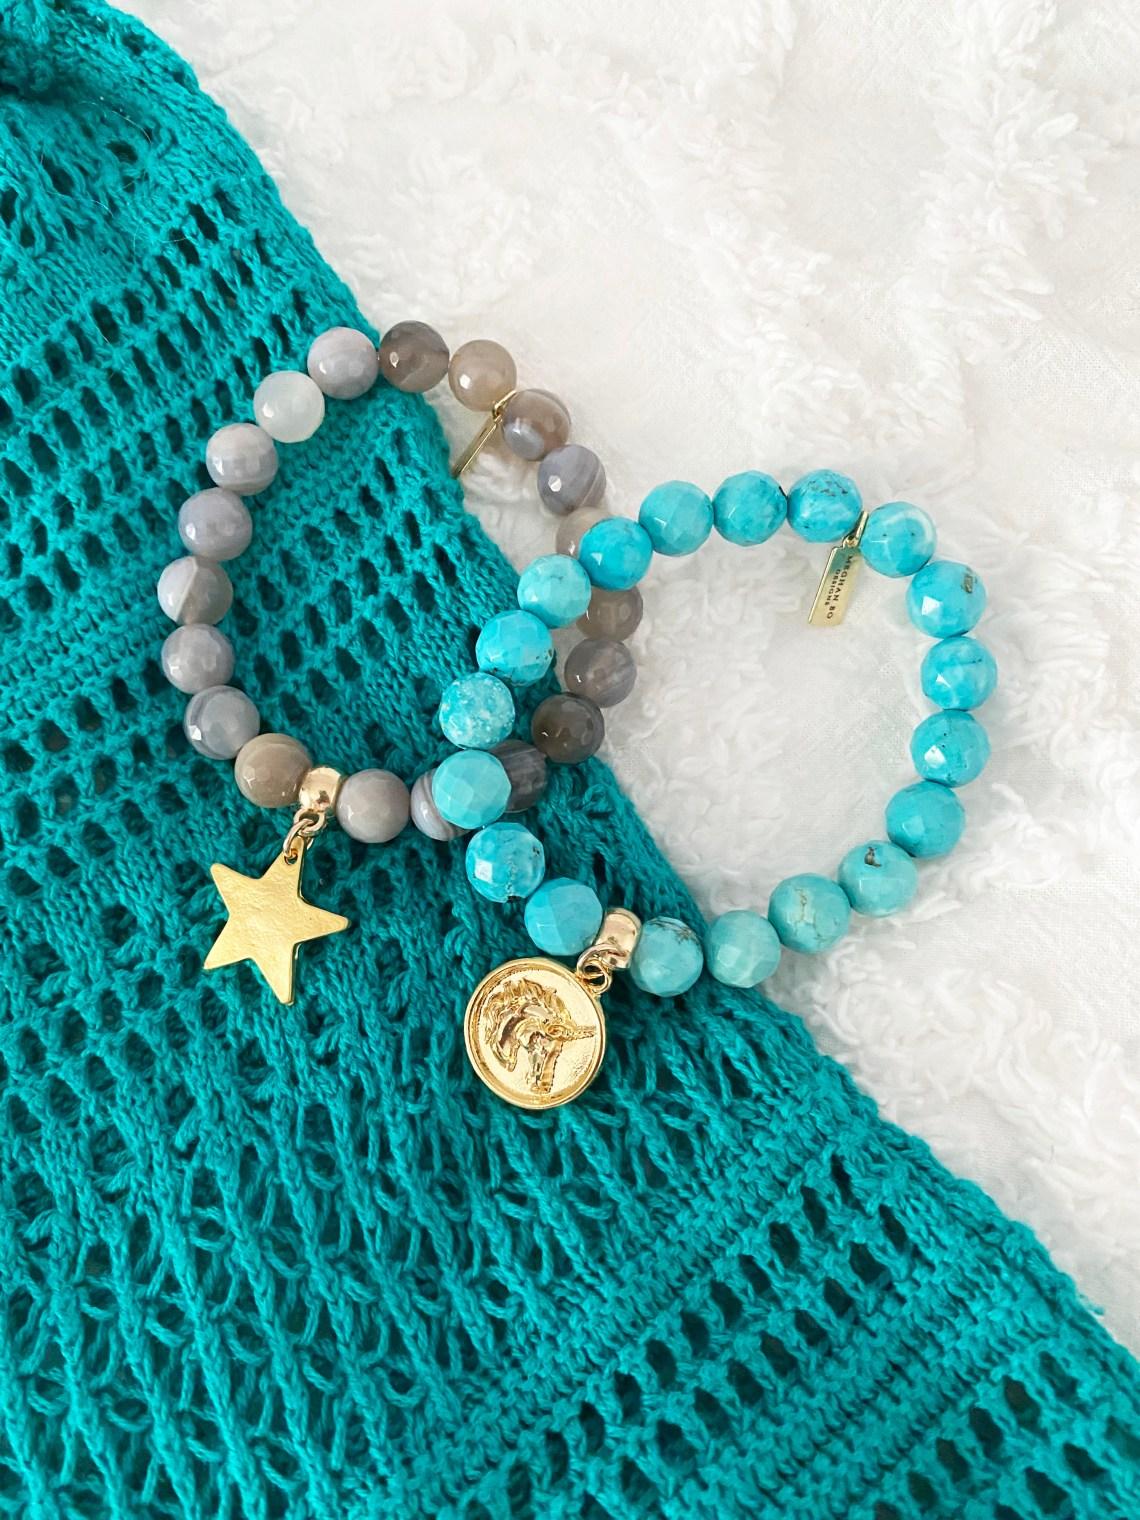 Beaded-Charm-Bracelets